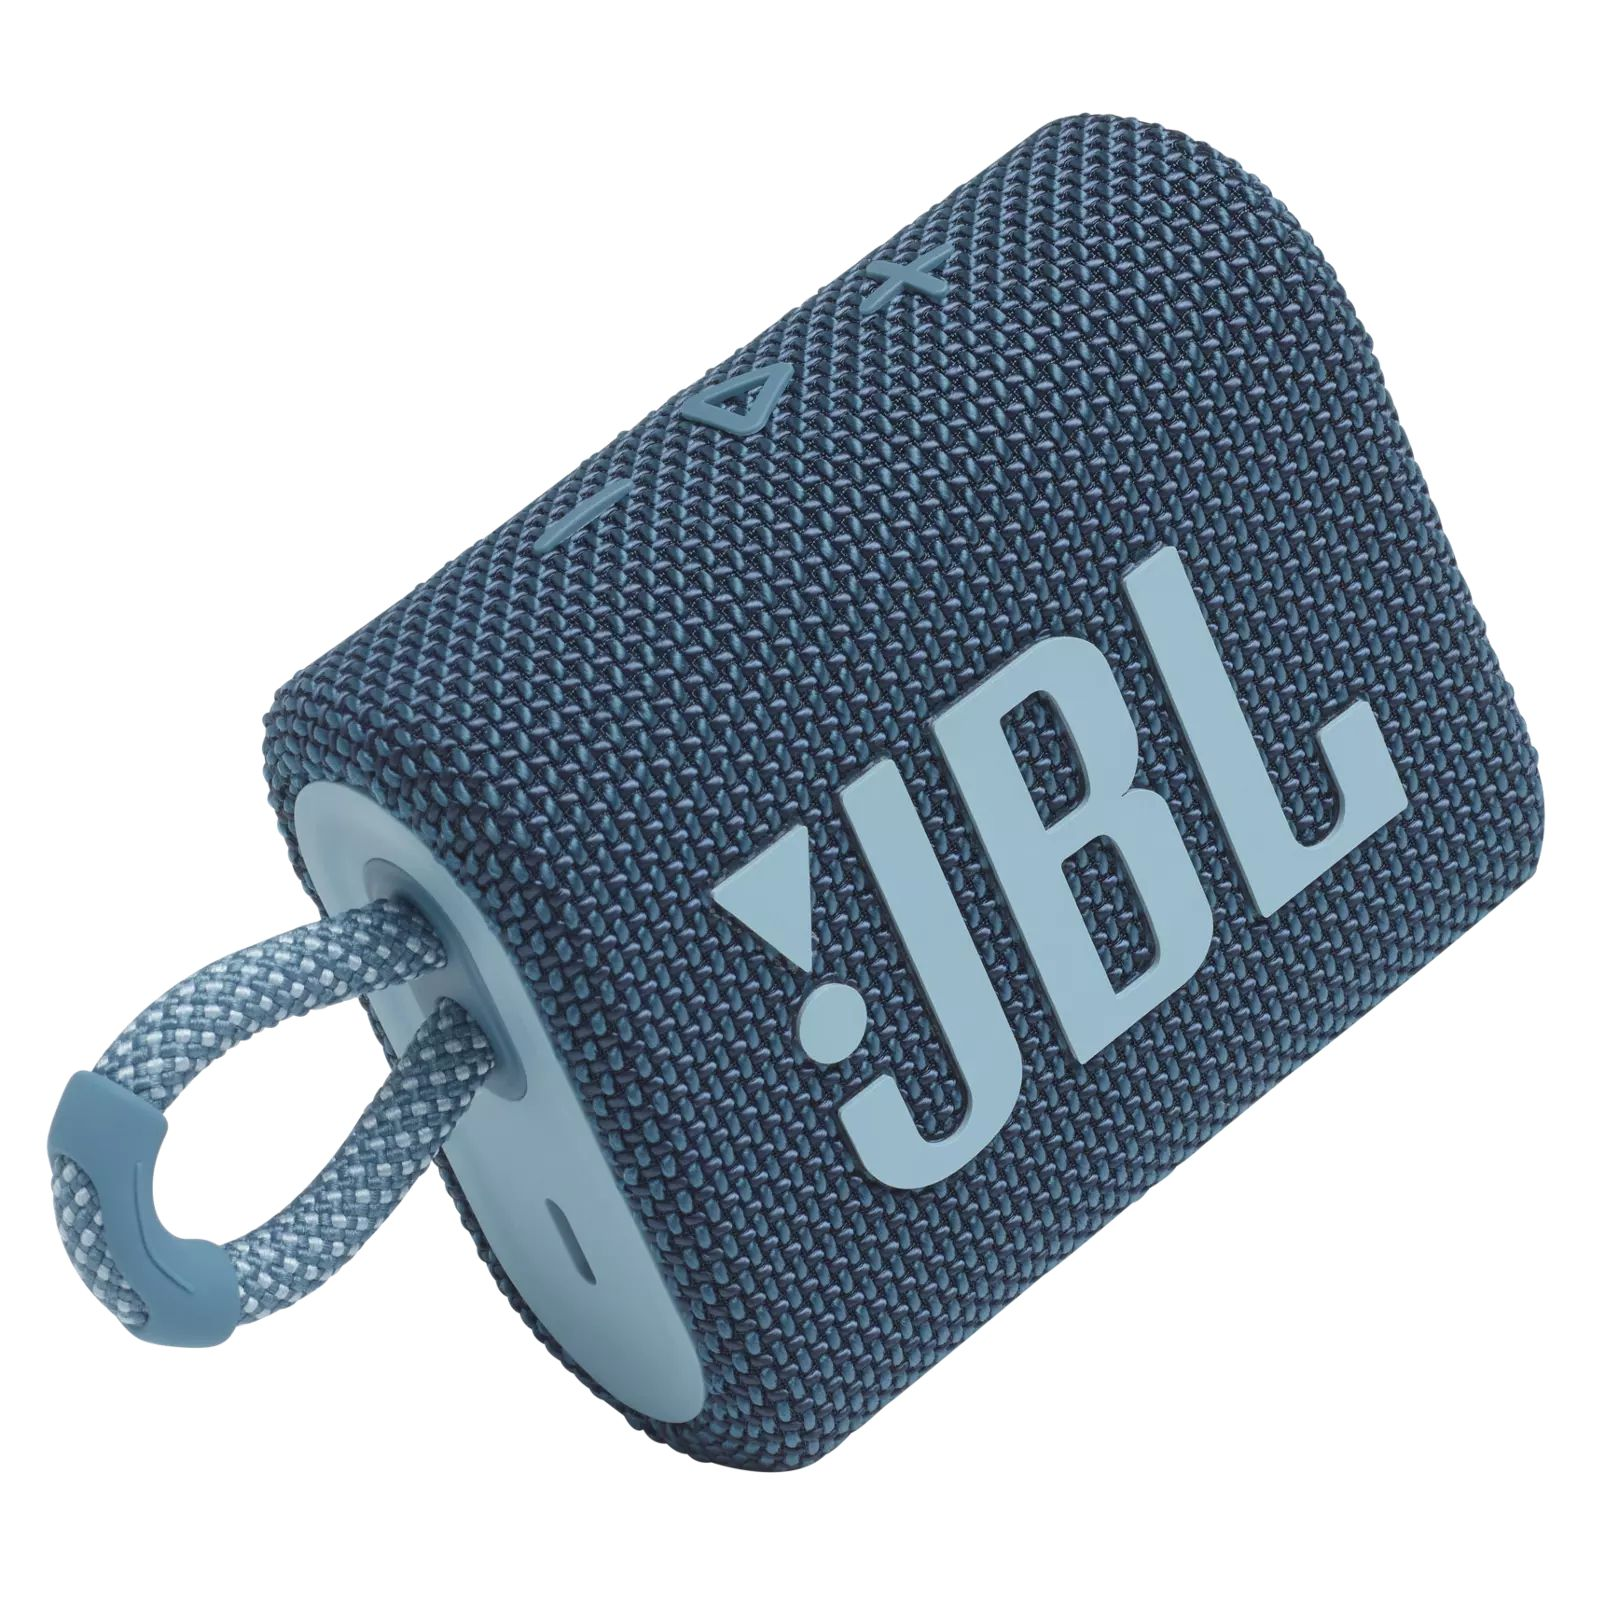 Caixa de Som Bluetooth Portatil JBL GO 3 - Azul JBLGO3BLU